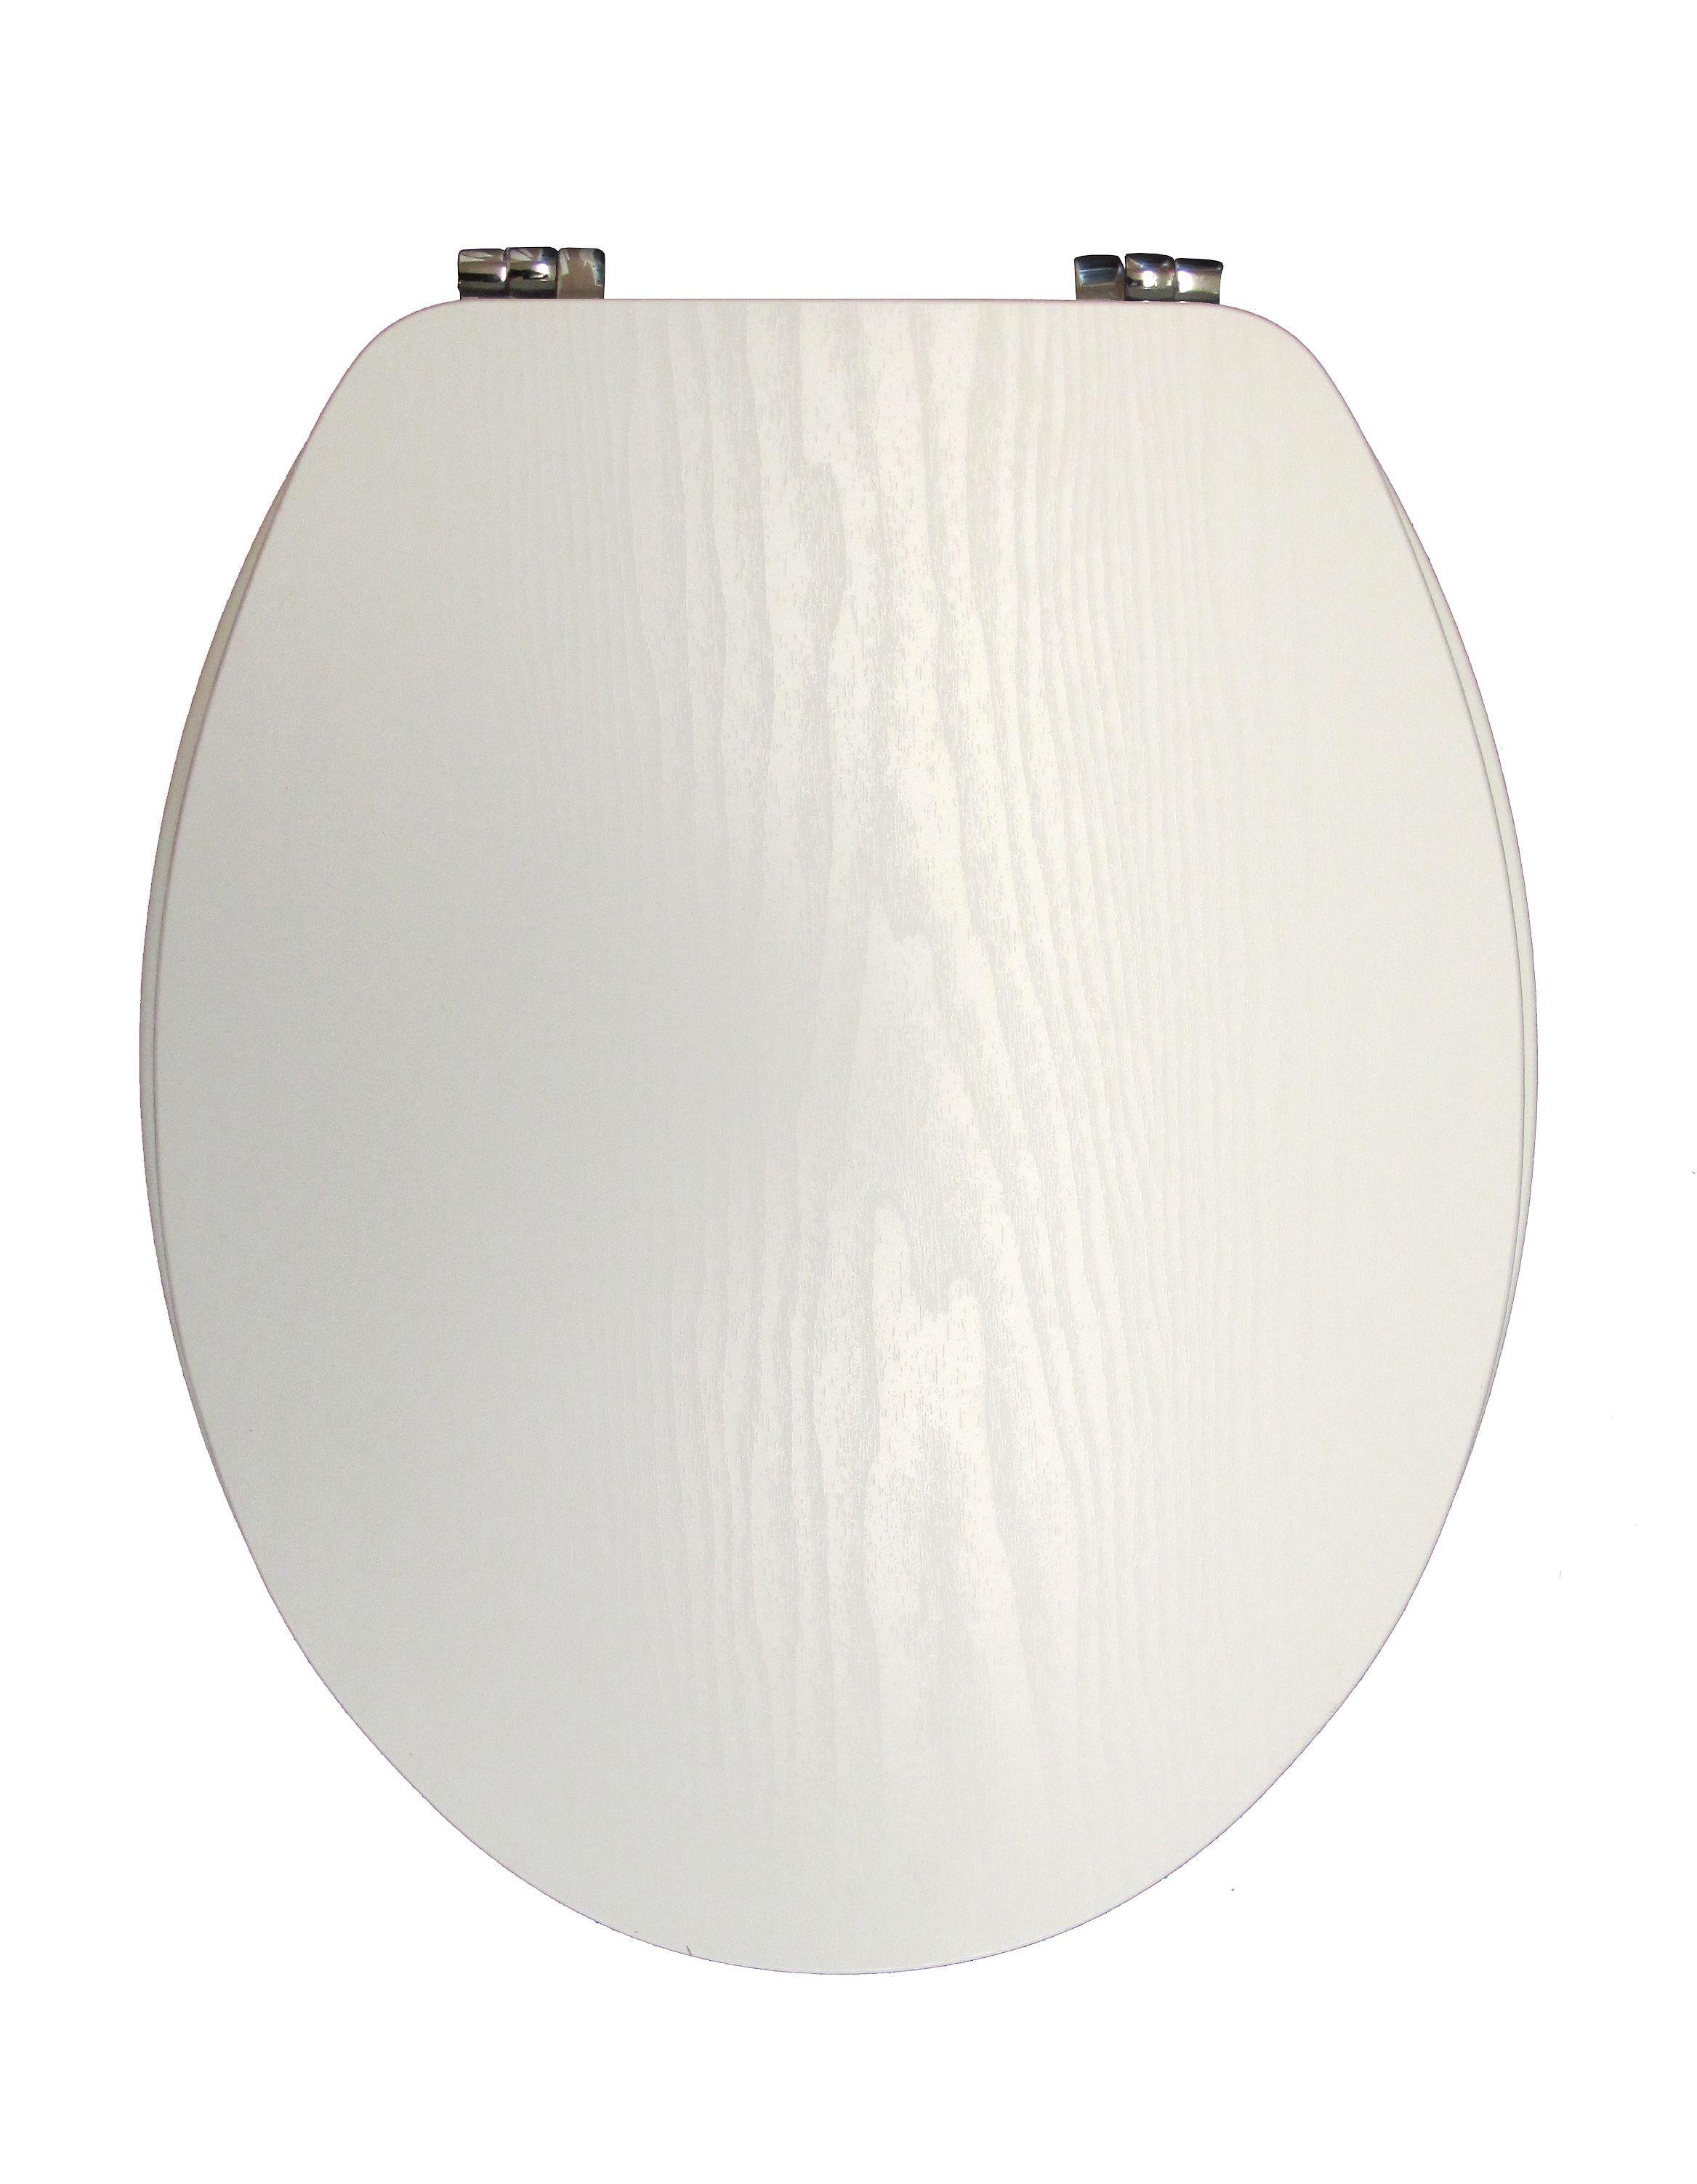 Amazing Cooke Lewis Wooden White Toilet Seat Departments Diy At Bq Creativecarmelina Interior Chair Design Creativecarmelinacom